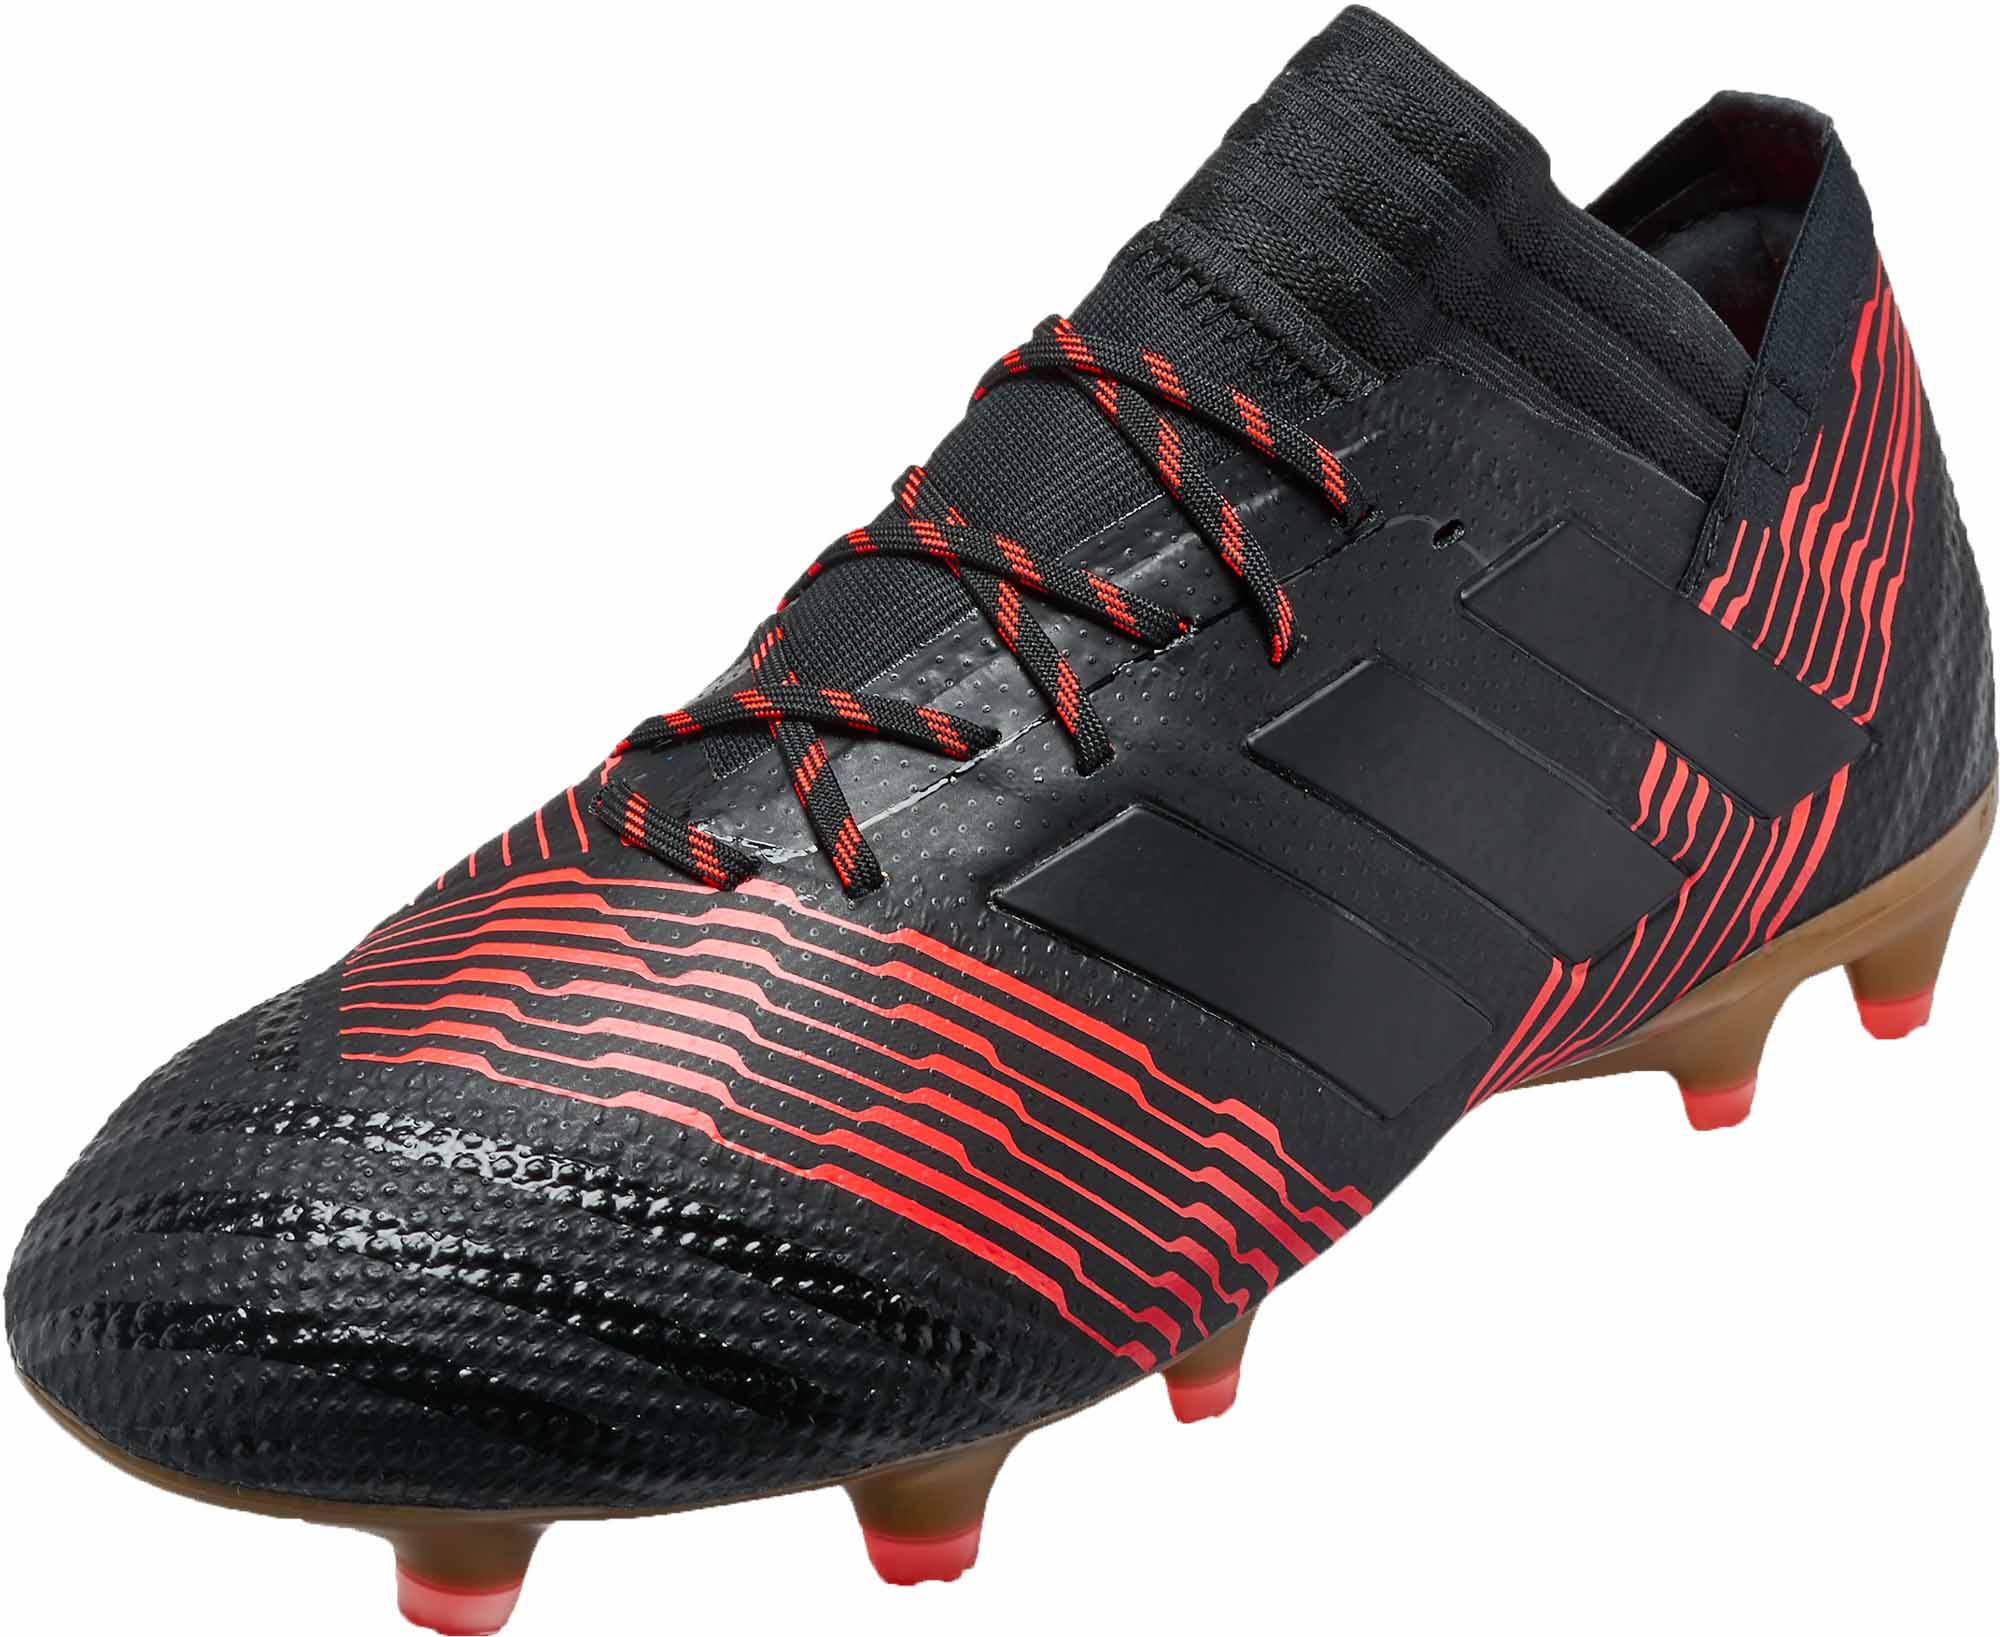 adidas Nemeziz 17.1 FG - Black adidas Soccer Cleats b09116b53